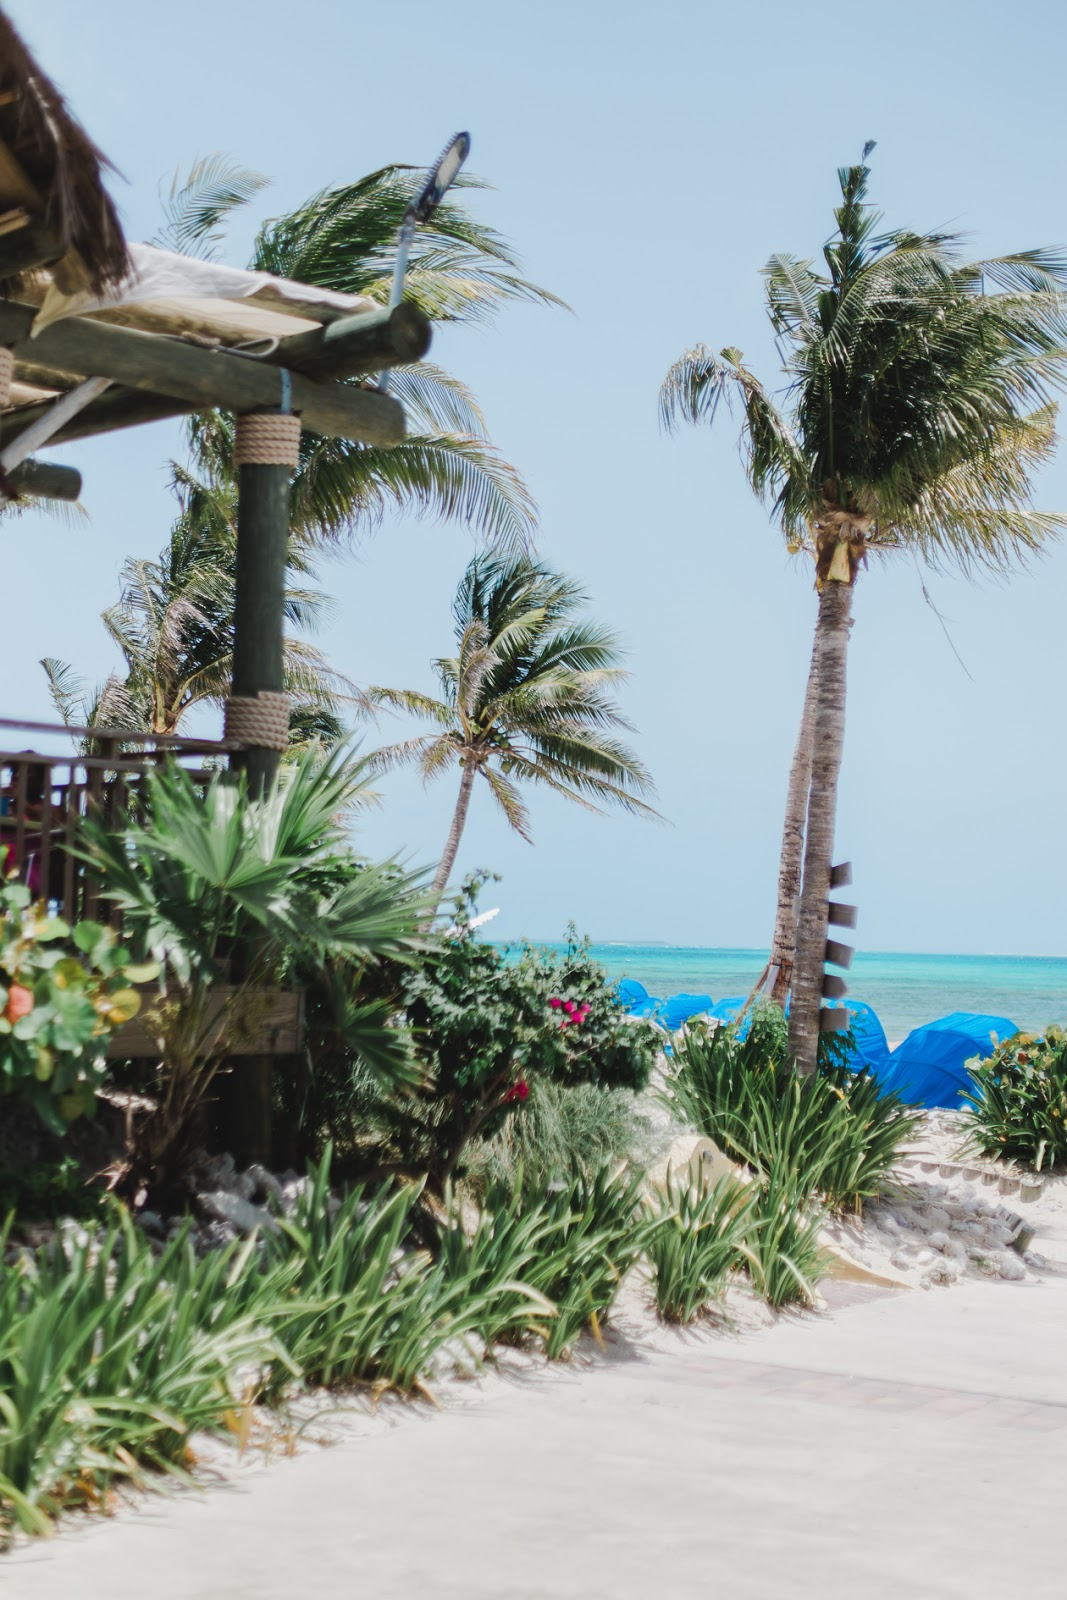 grand turk island, carnival cruise, life and messy hair, xo samantha brooke, lifestyle blogger, nc blogger, nc photographer, caribbean photos, caribbean